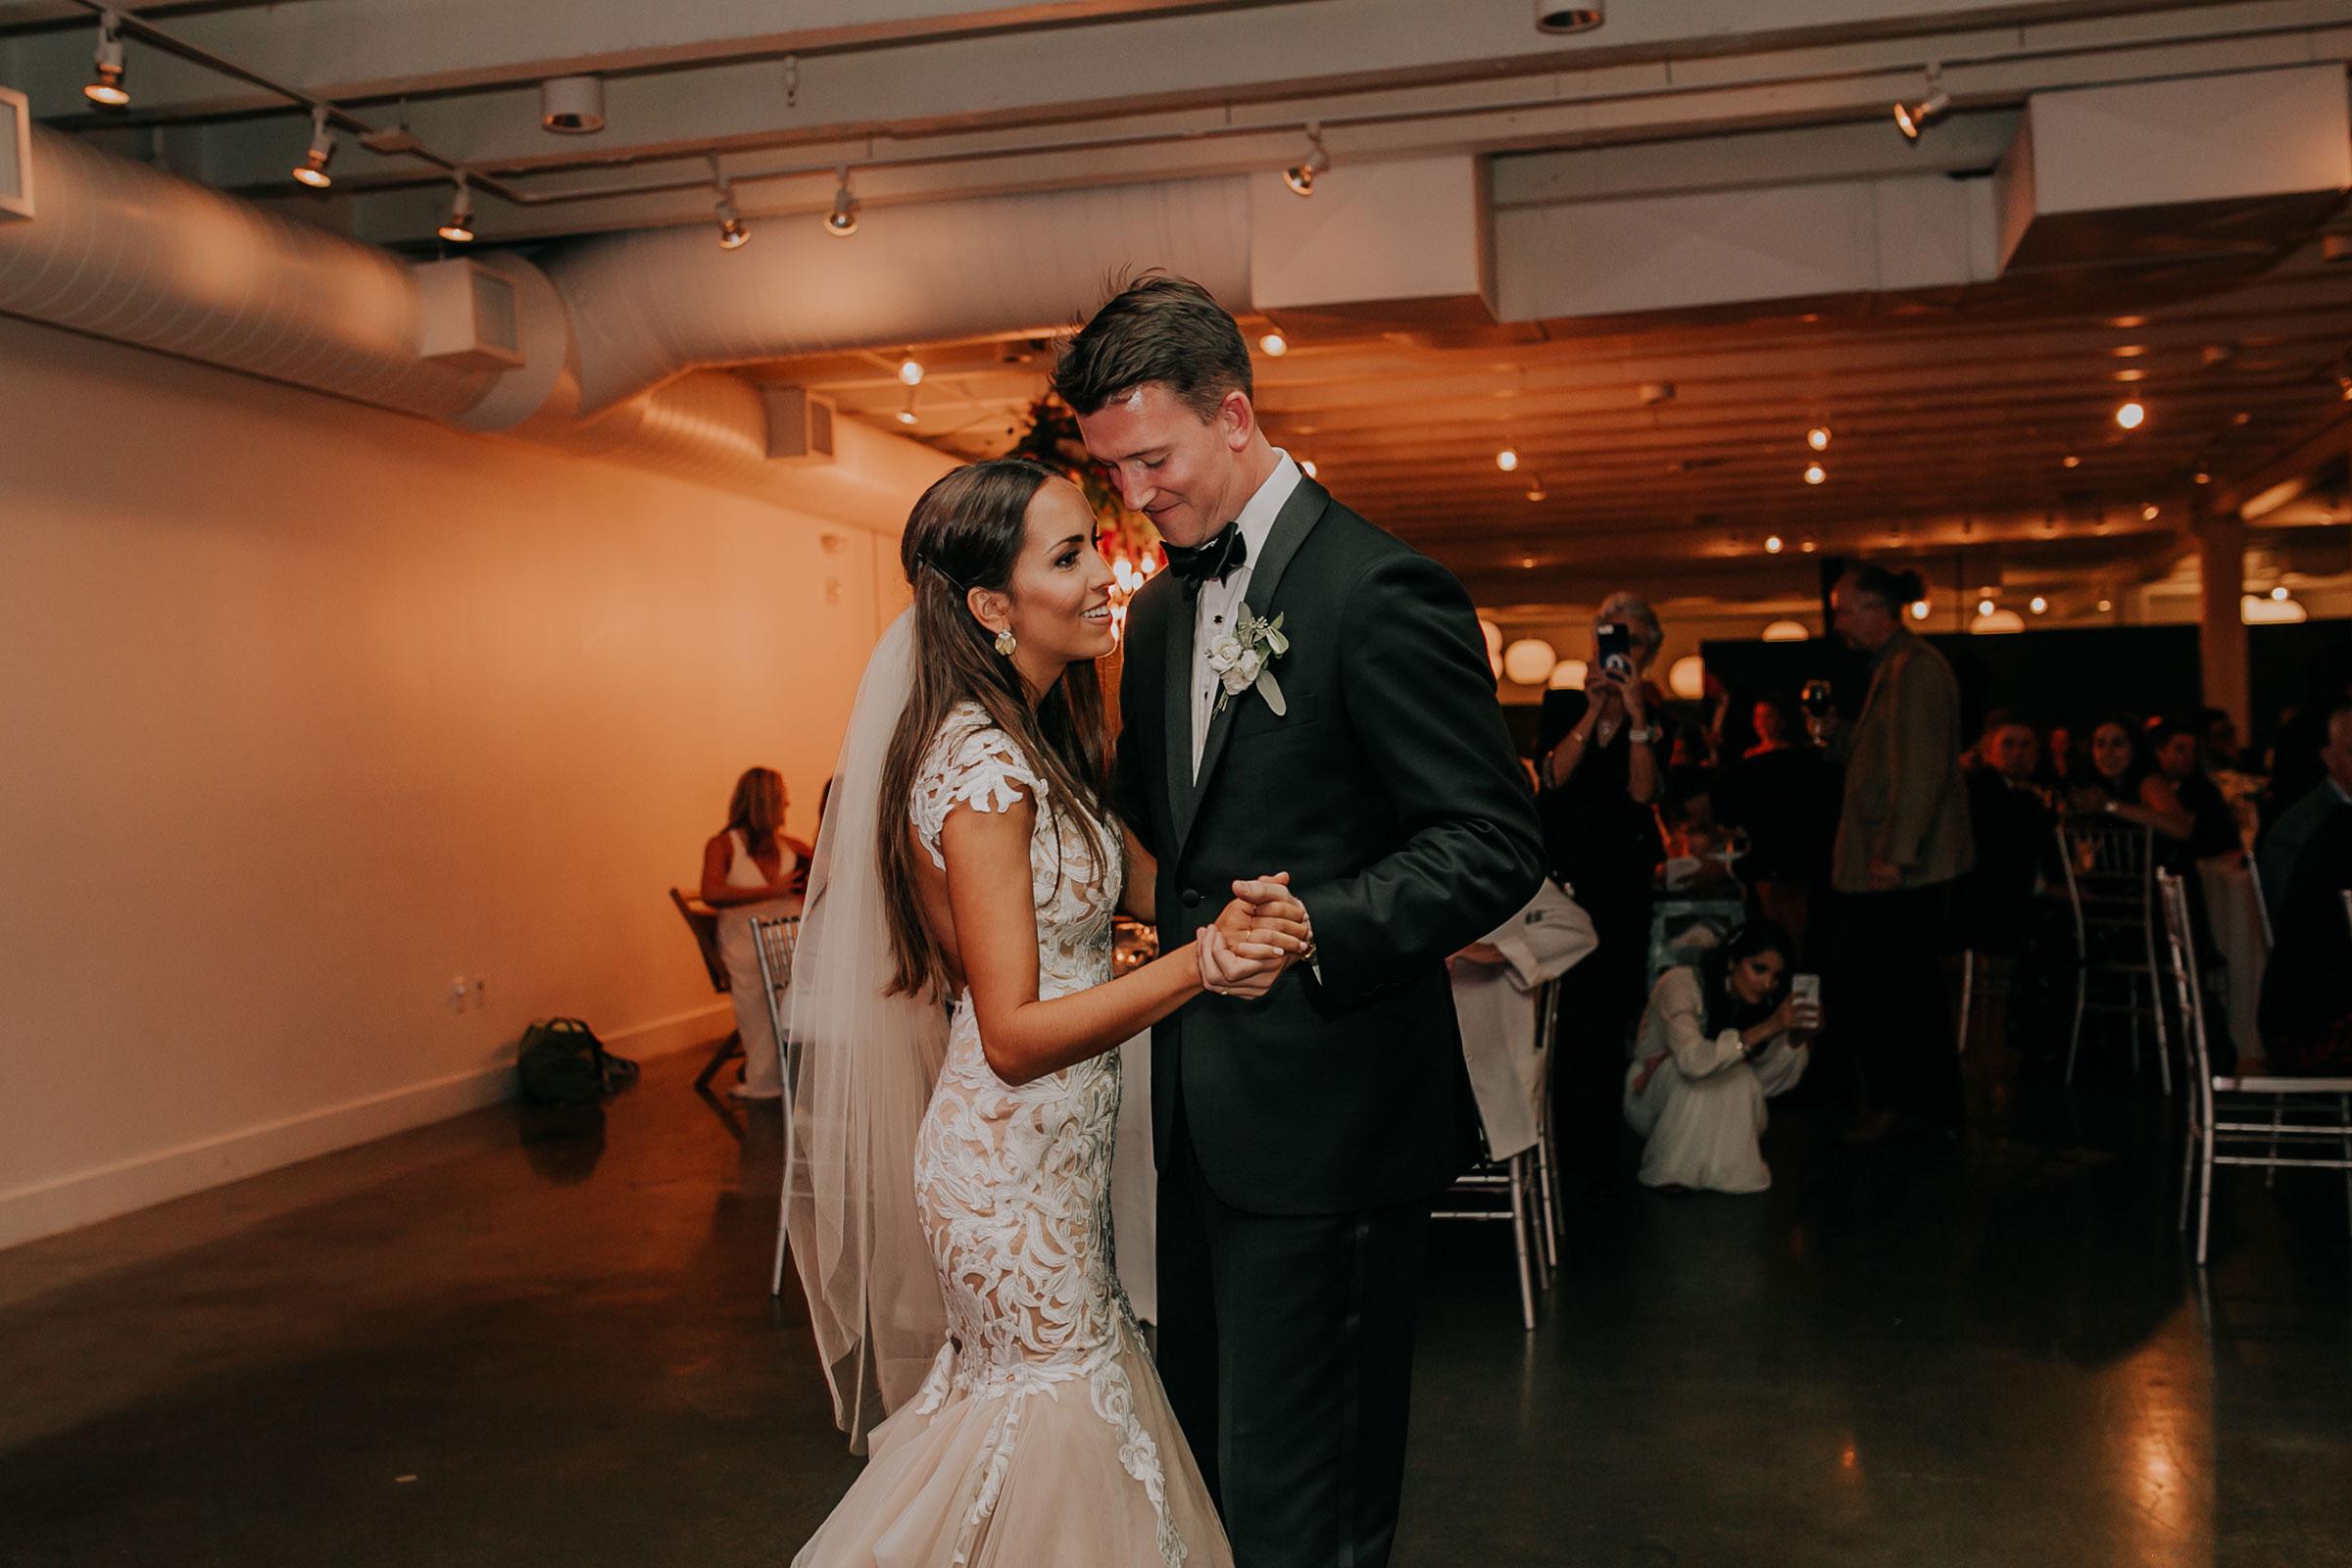 bride-groom-first-dance-founders-one-nine-omaha-nebraska-raelyn-ramey-photography.jpg